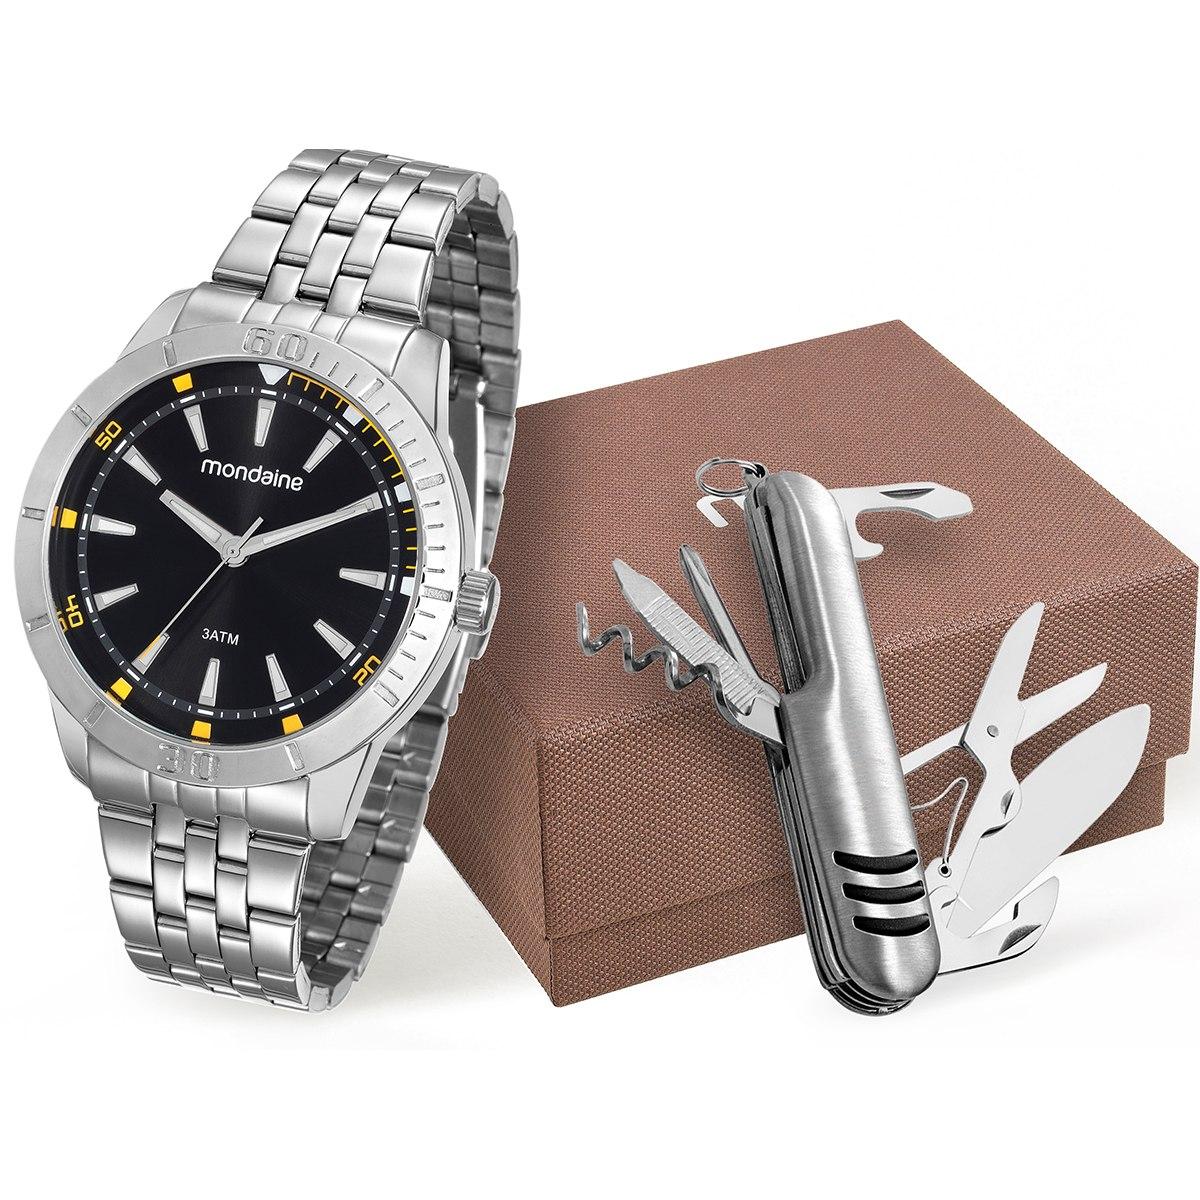 8fc6c1034 Kit Relógio Mondaine Masculino 99144g0mvne1k1 - R  139